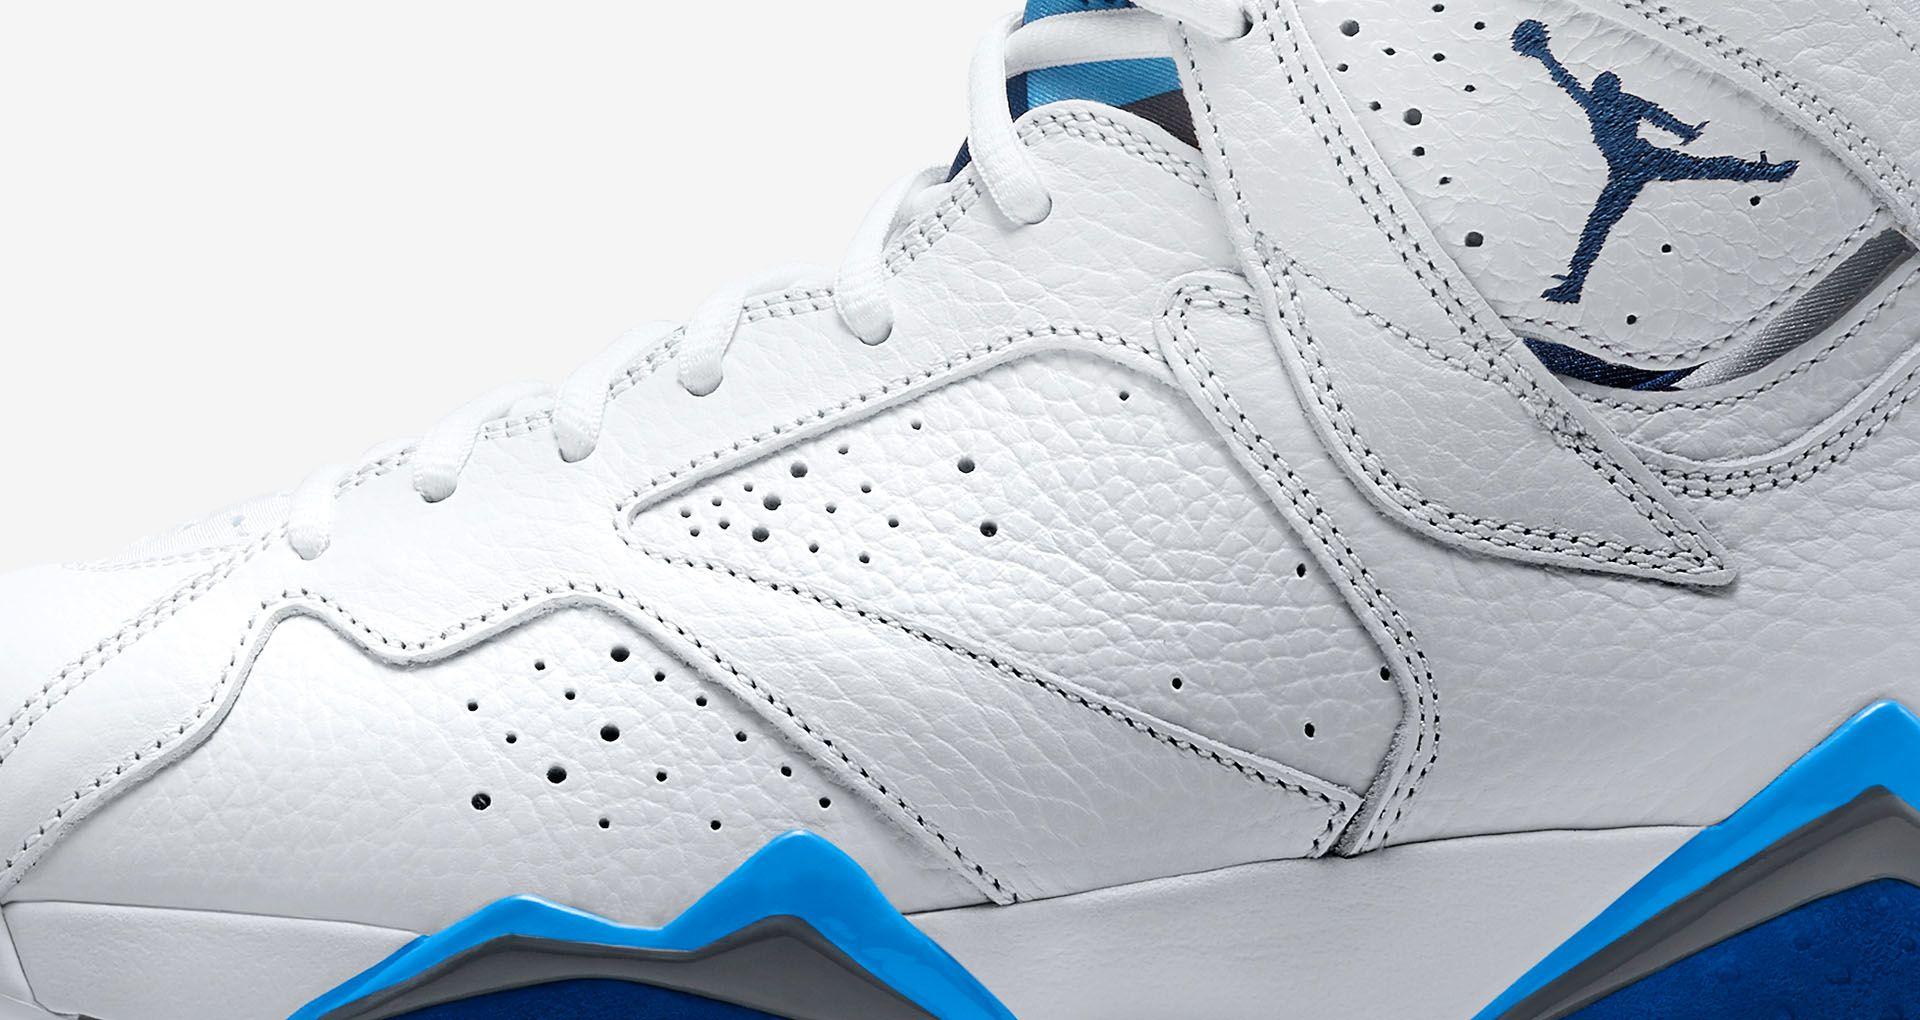 76861edcd87 Air Jordan 7 Retro 'French Blue'. Nike+ SNKRS